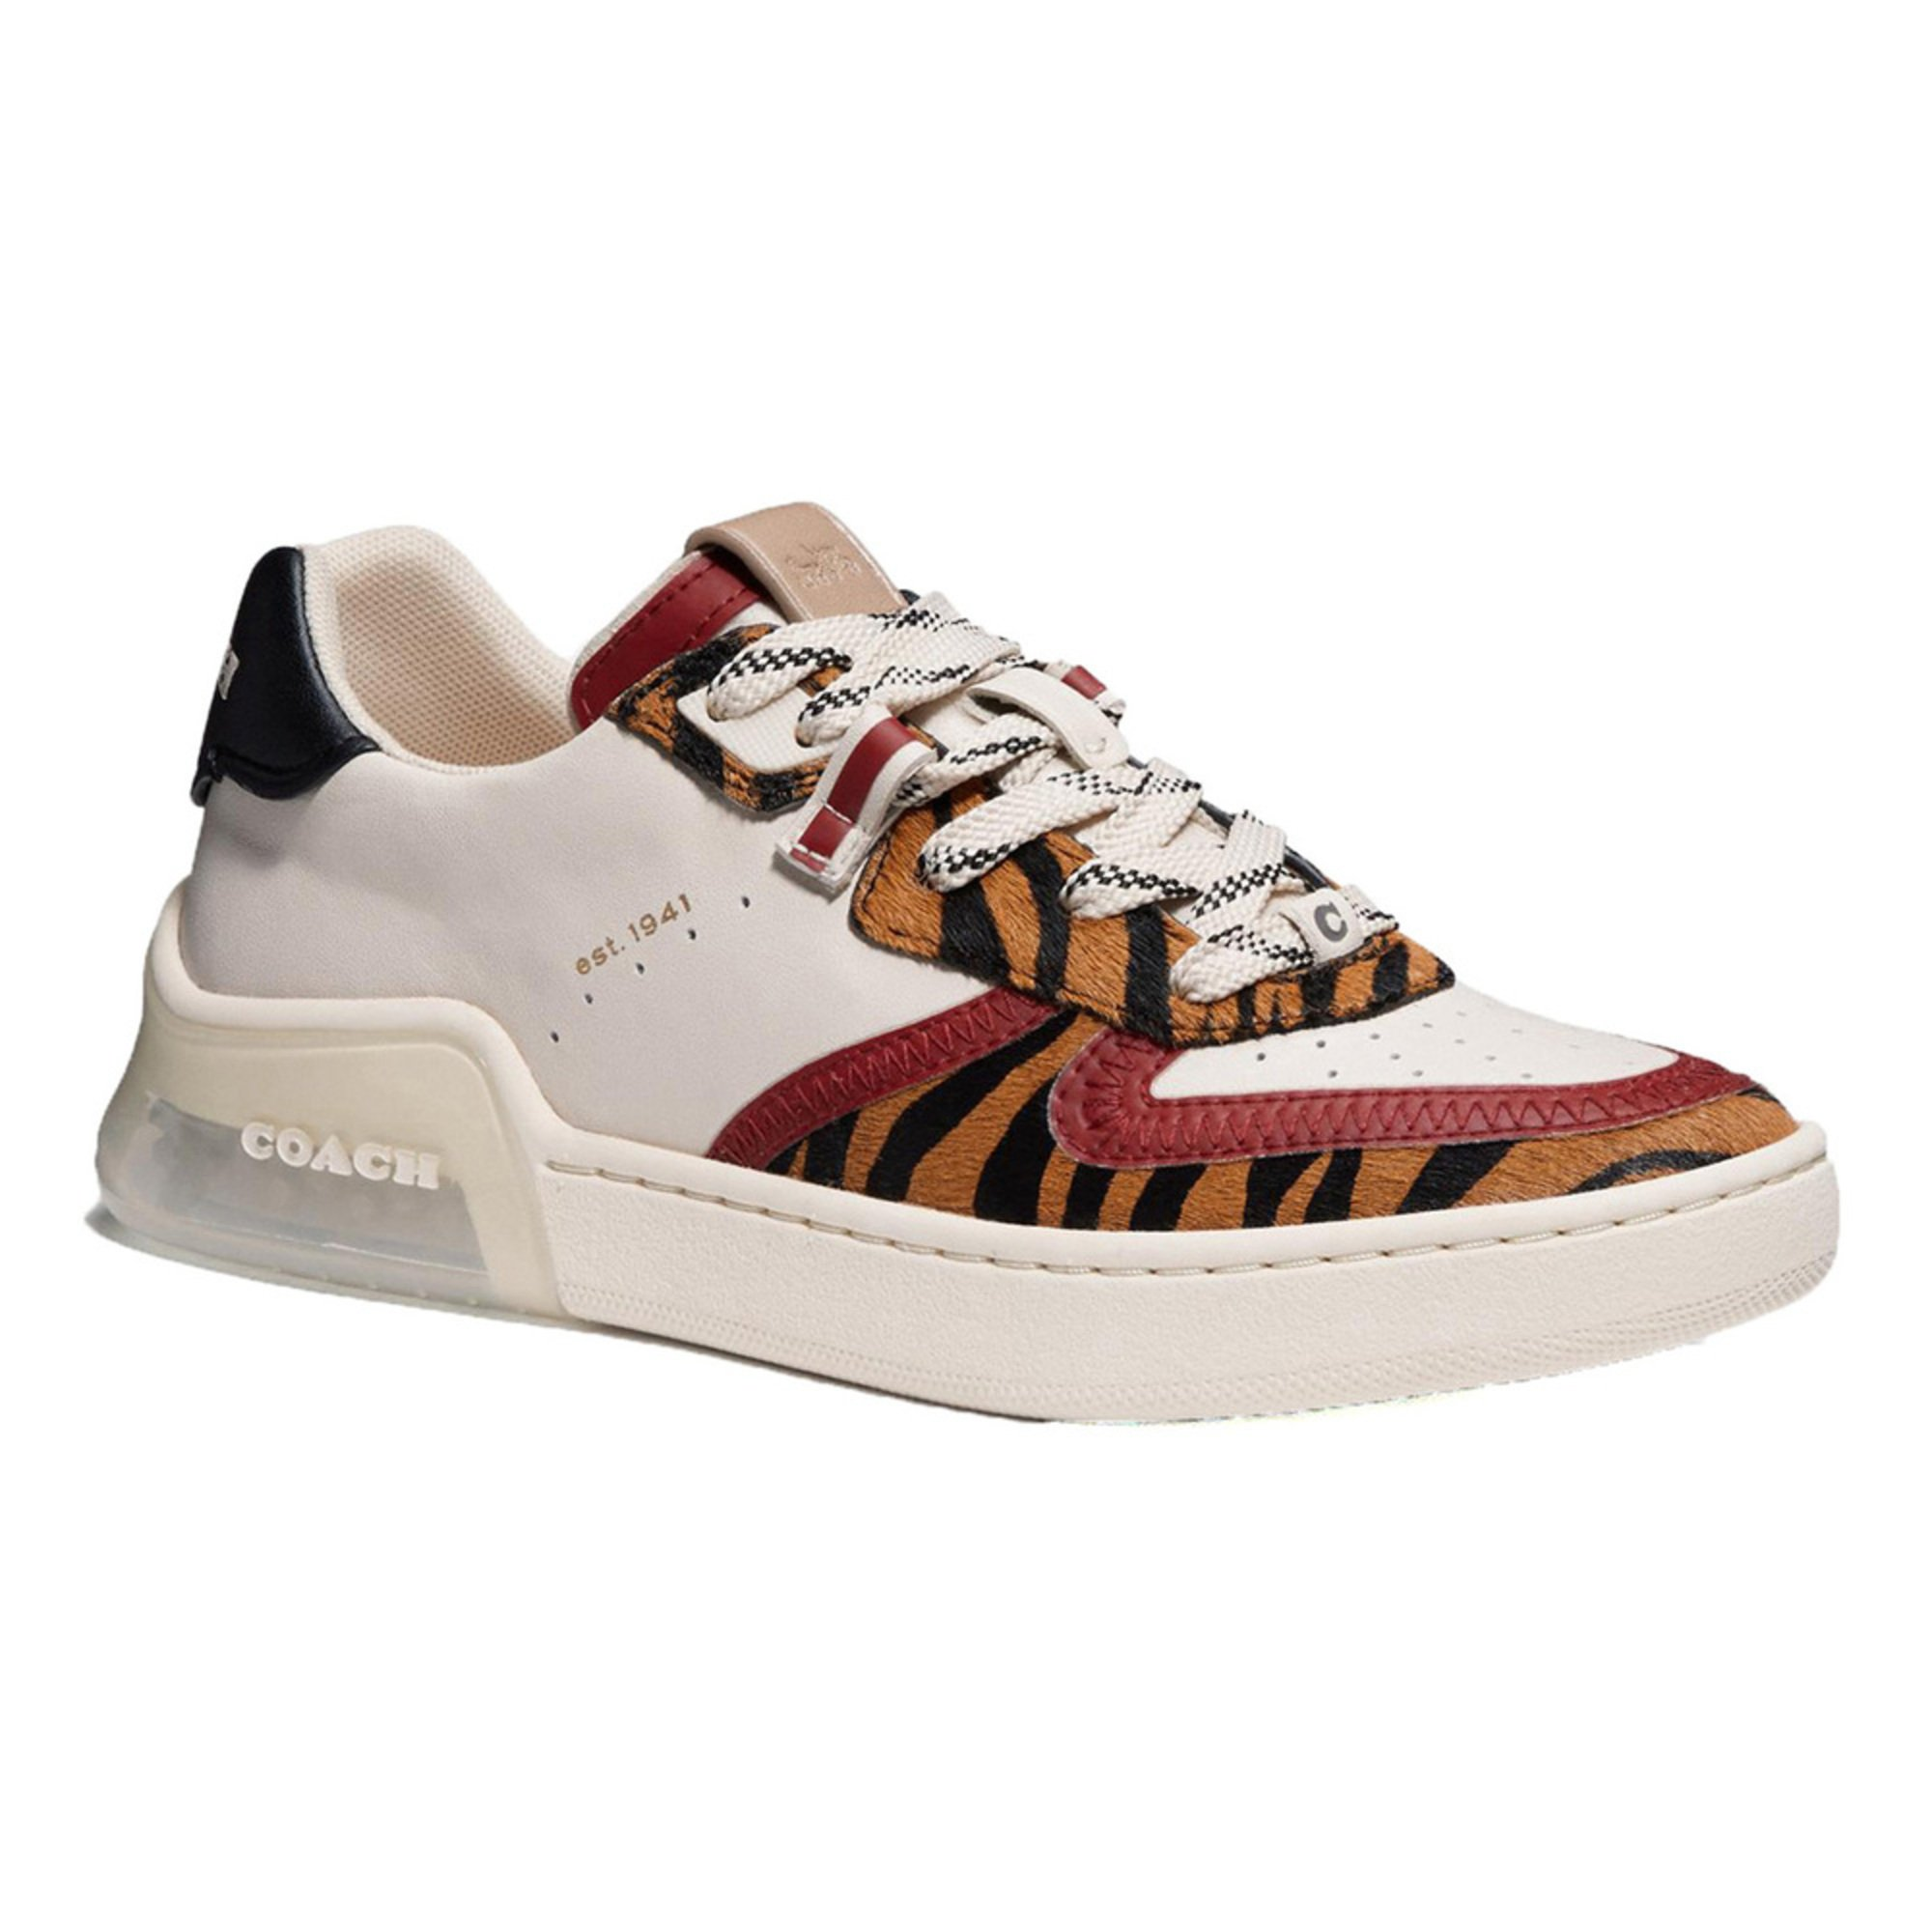 Coach Women's Citysole Court Sneaker